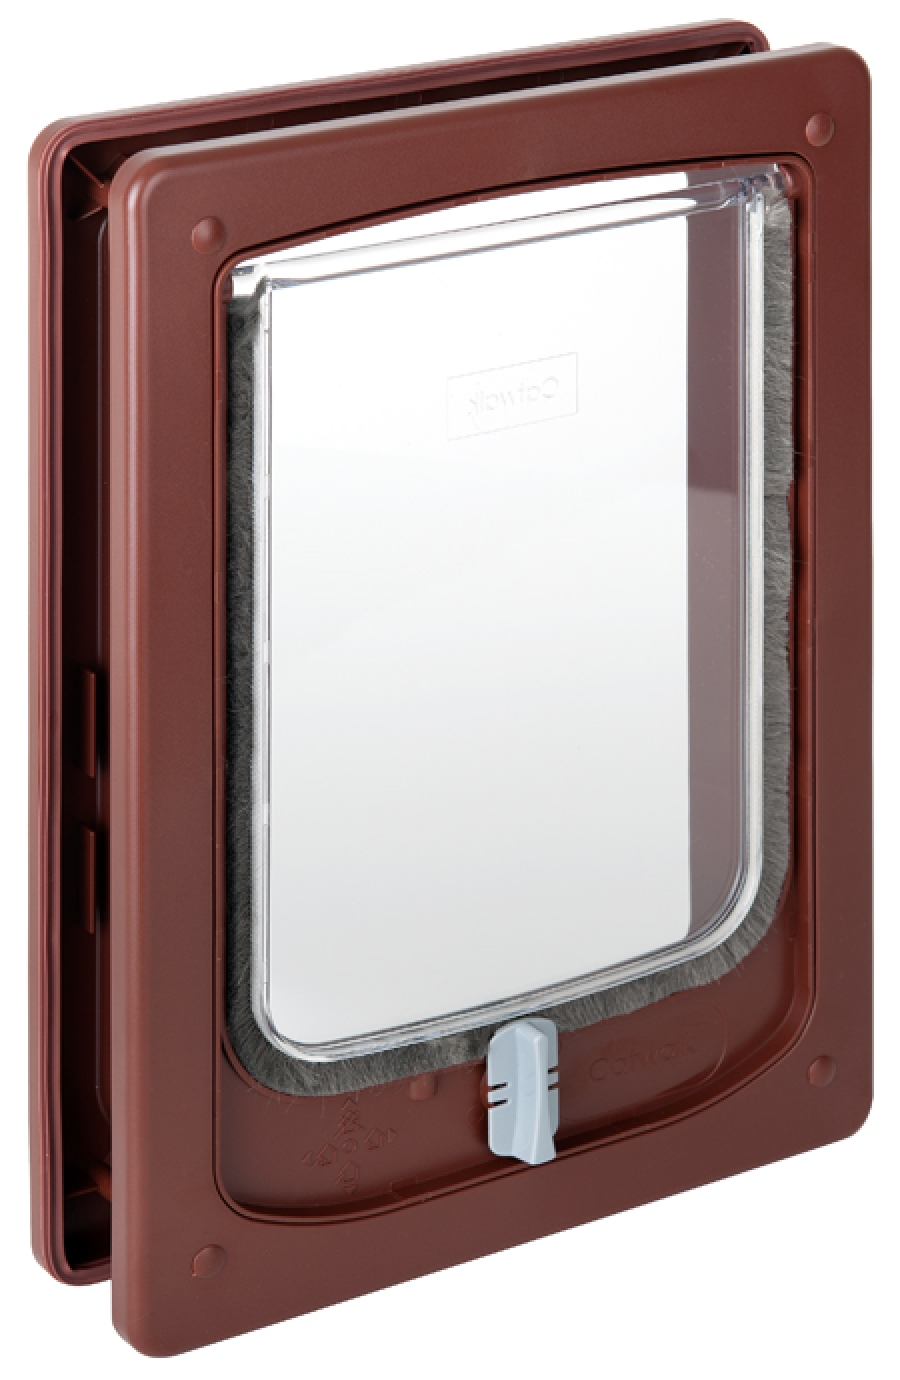 W-SDDTB Wood Fitting Small Dog Door Tunnel Brown.jpg